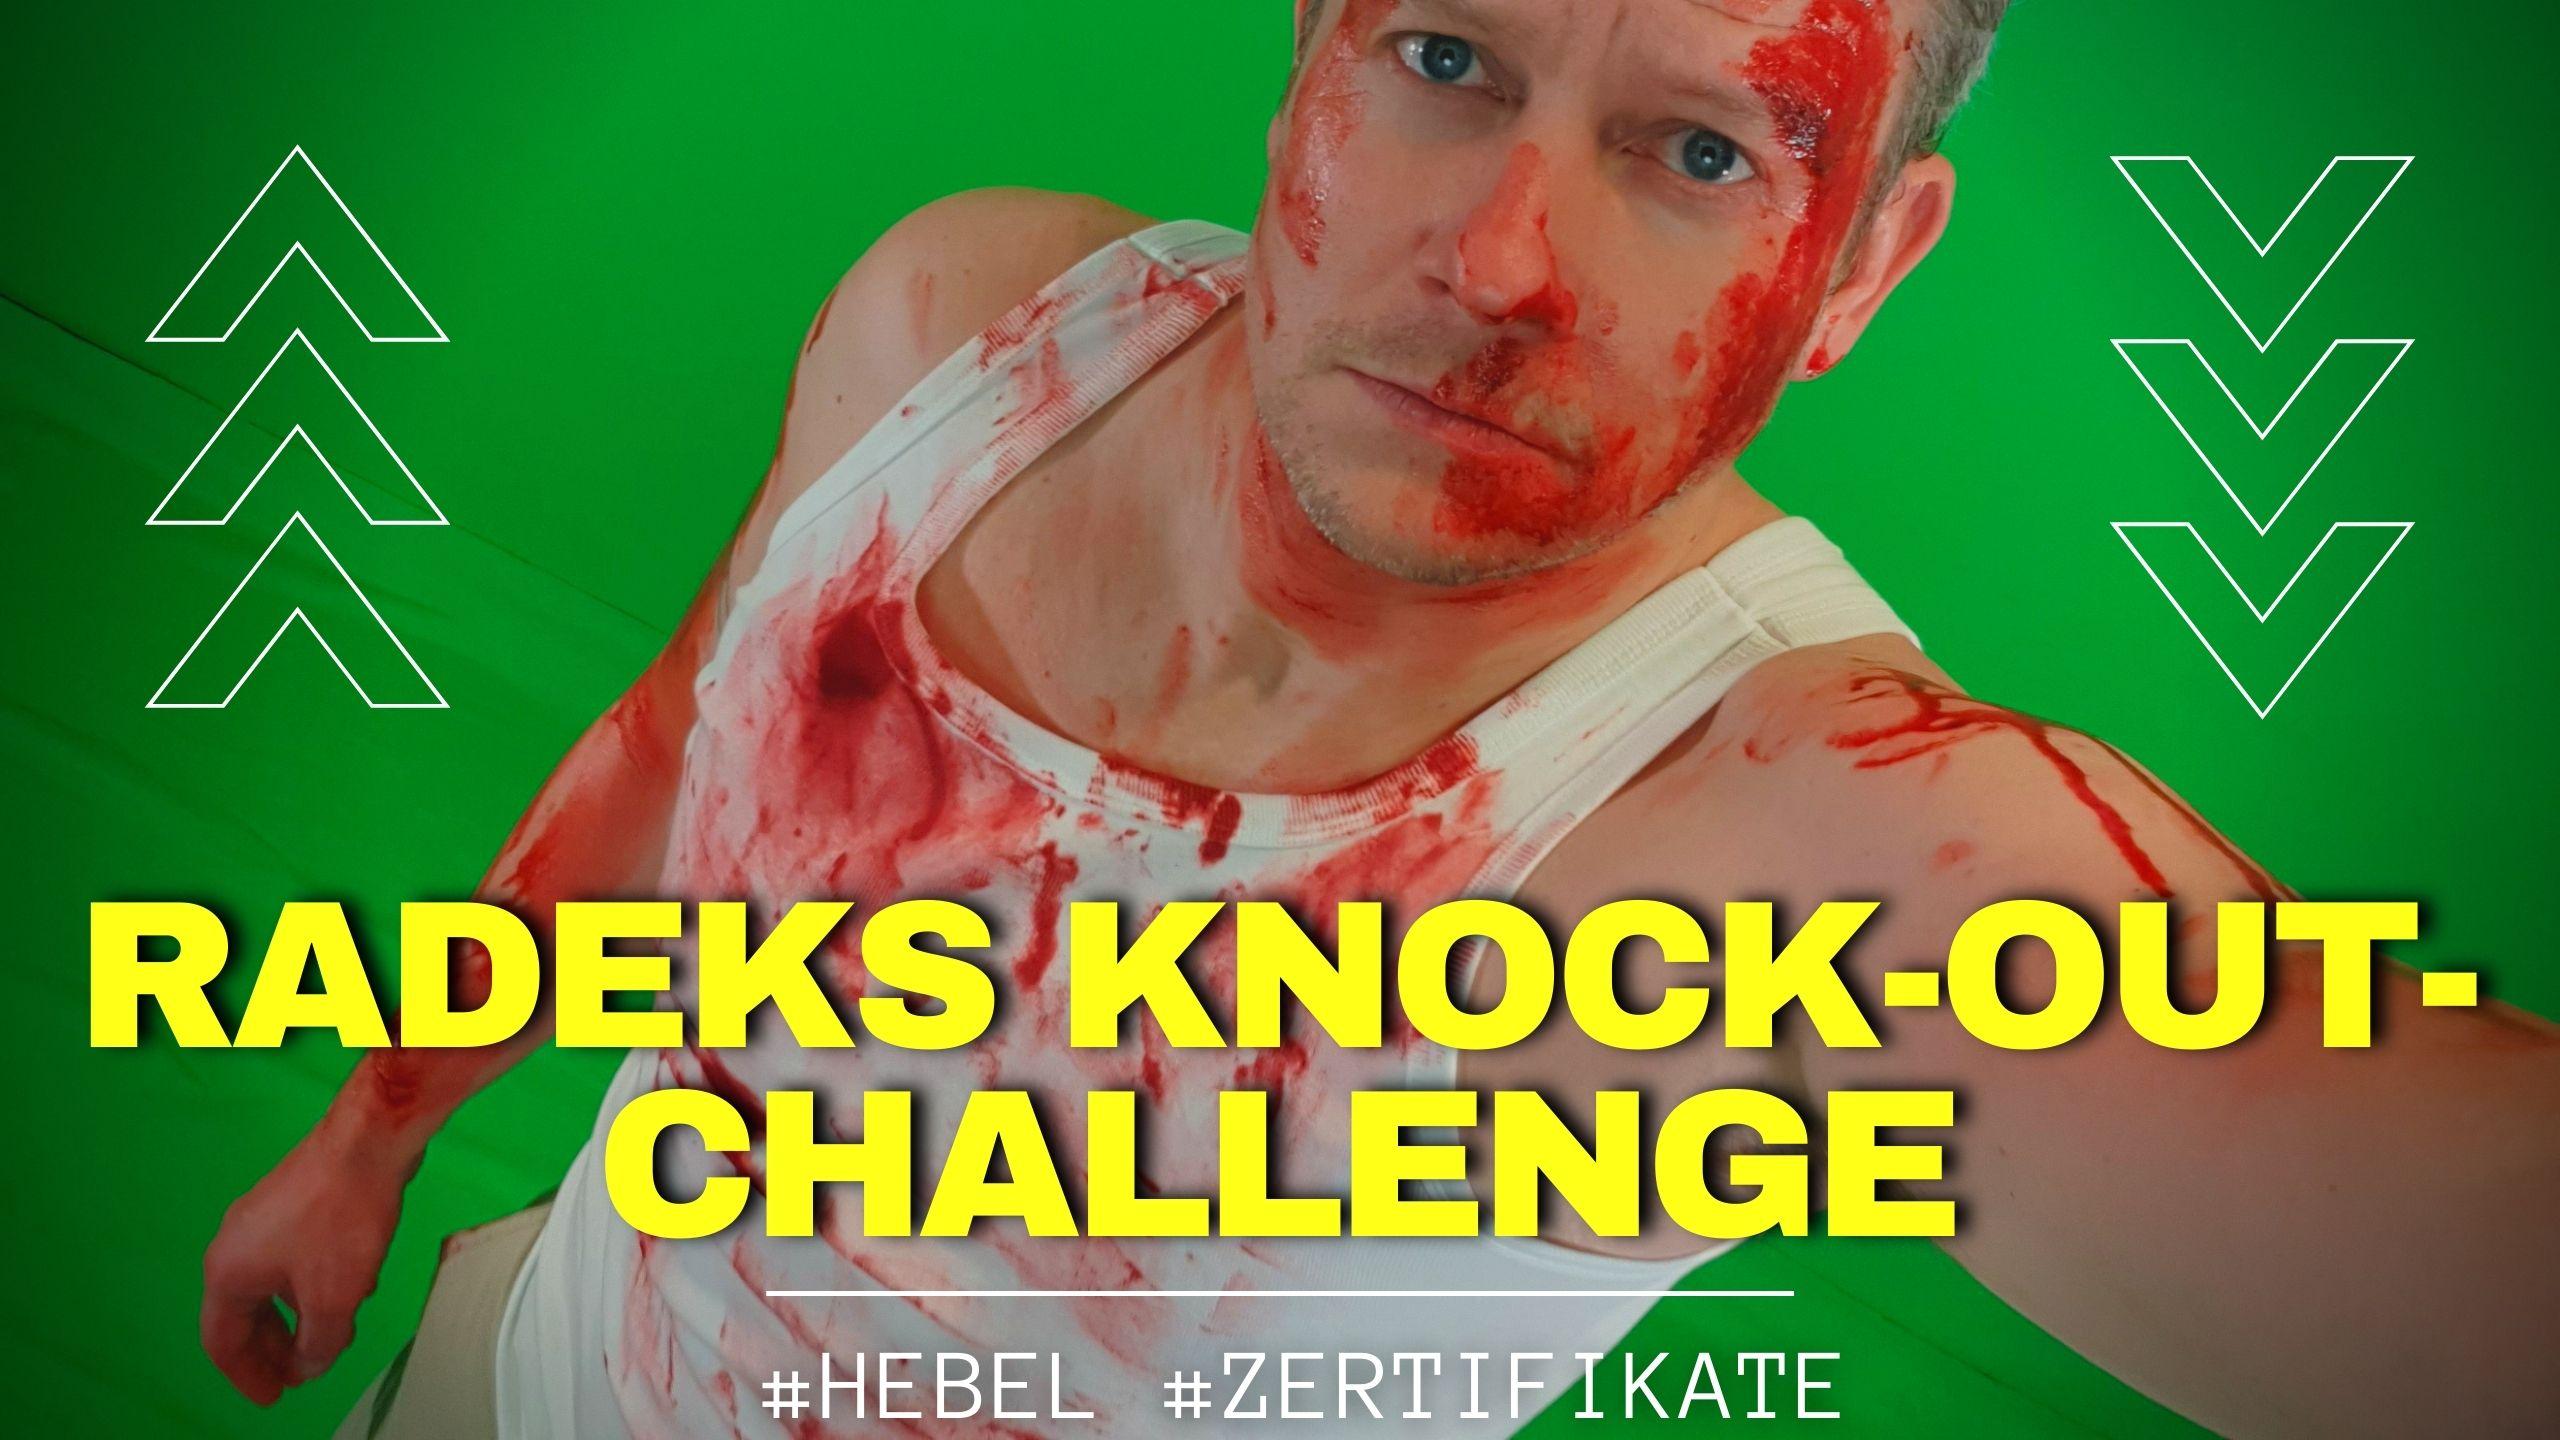 Radeks Erfahrungen mit Knock-Out-Zertifikaten